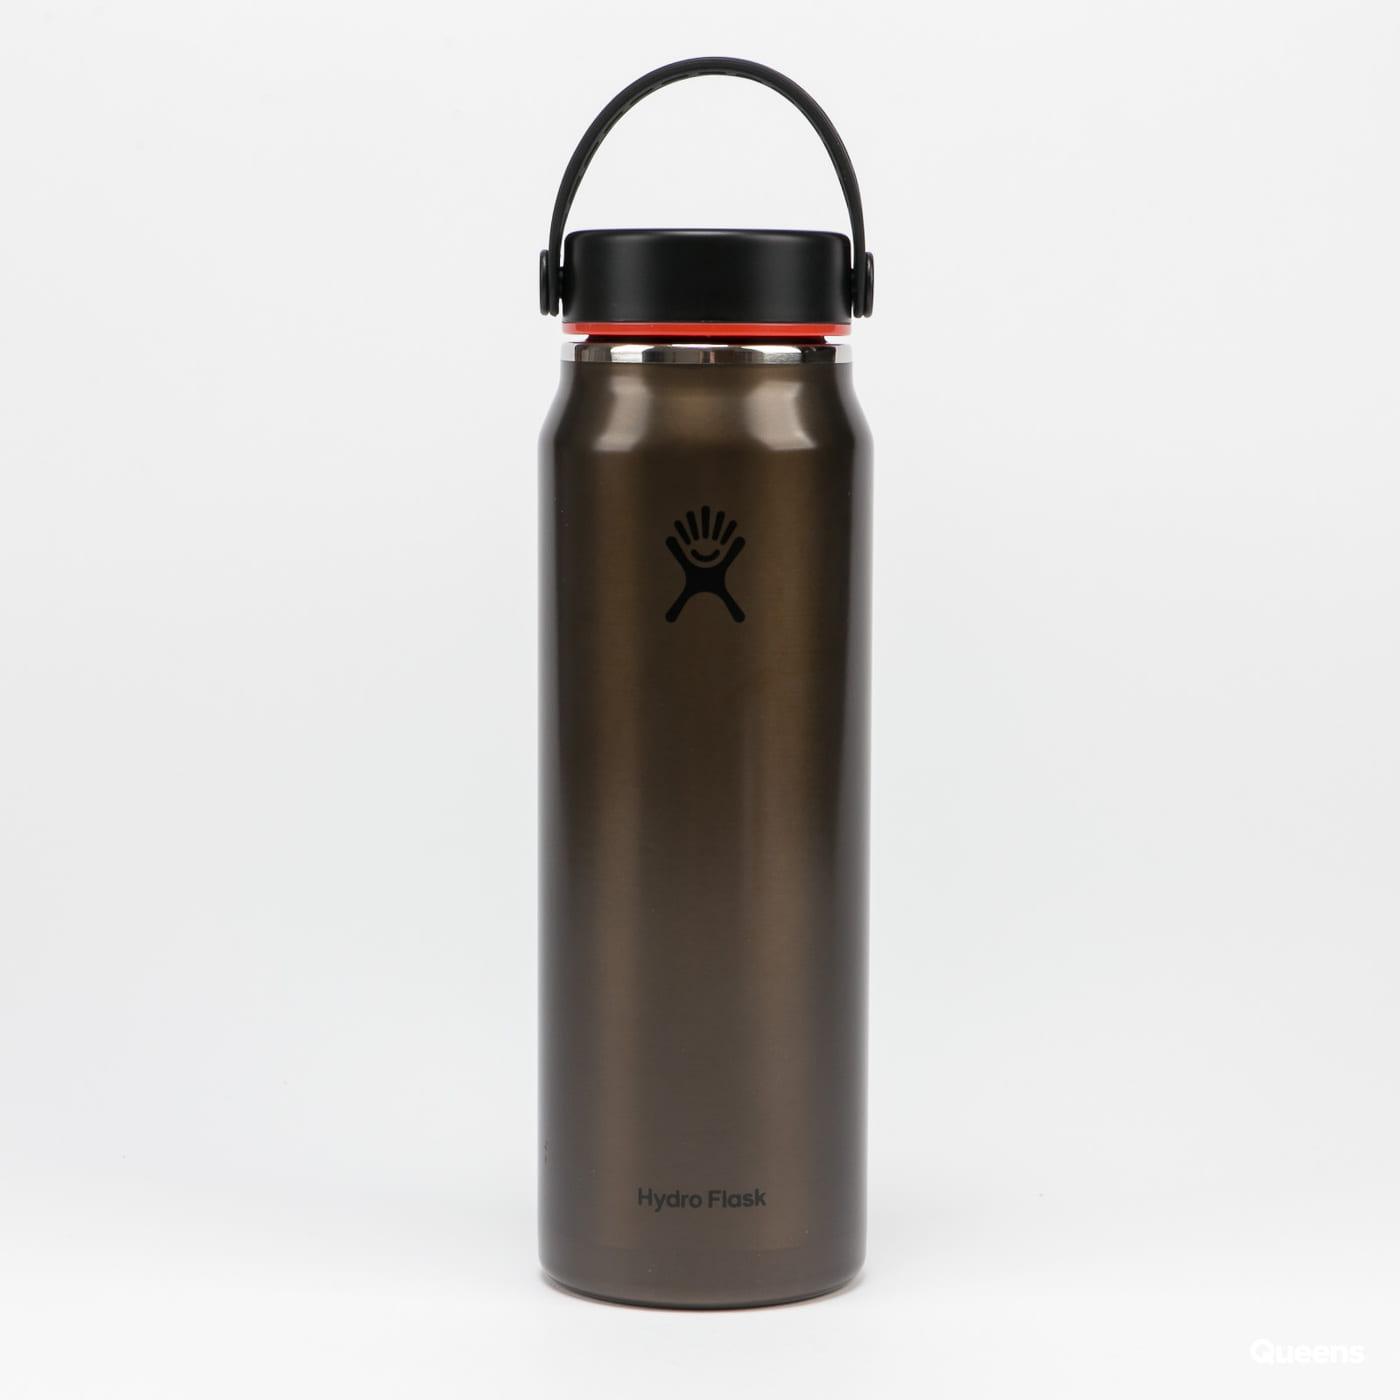 Hydro Flask Lightweight Wide Flex Cap (946ml) brown